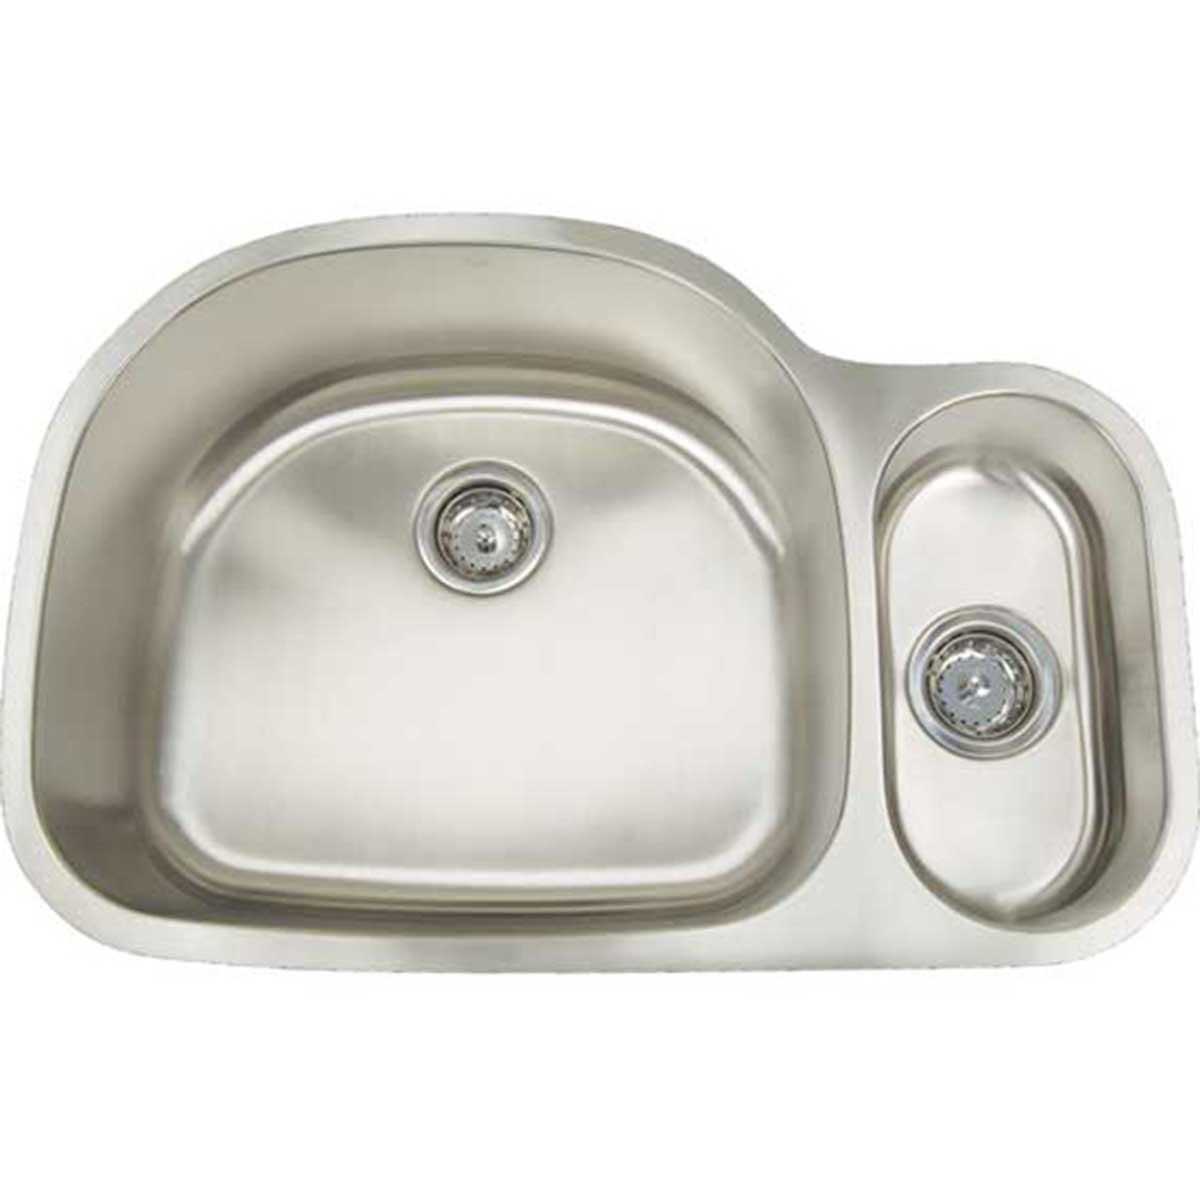 artisan sinks reversed draw  artisan sinks double bowl ar3121 d9     artisan kitchen sinks 16 gauge double bowl  contractors direct   rh   contractorsdirect com